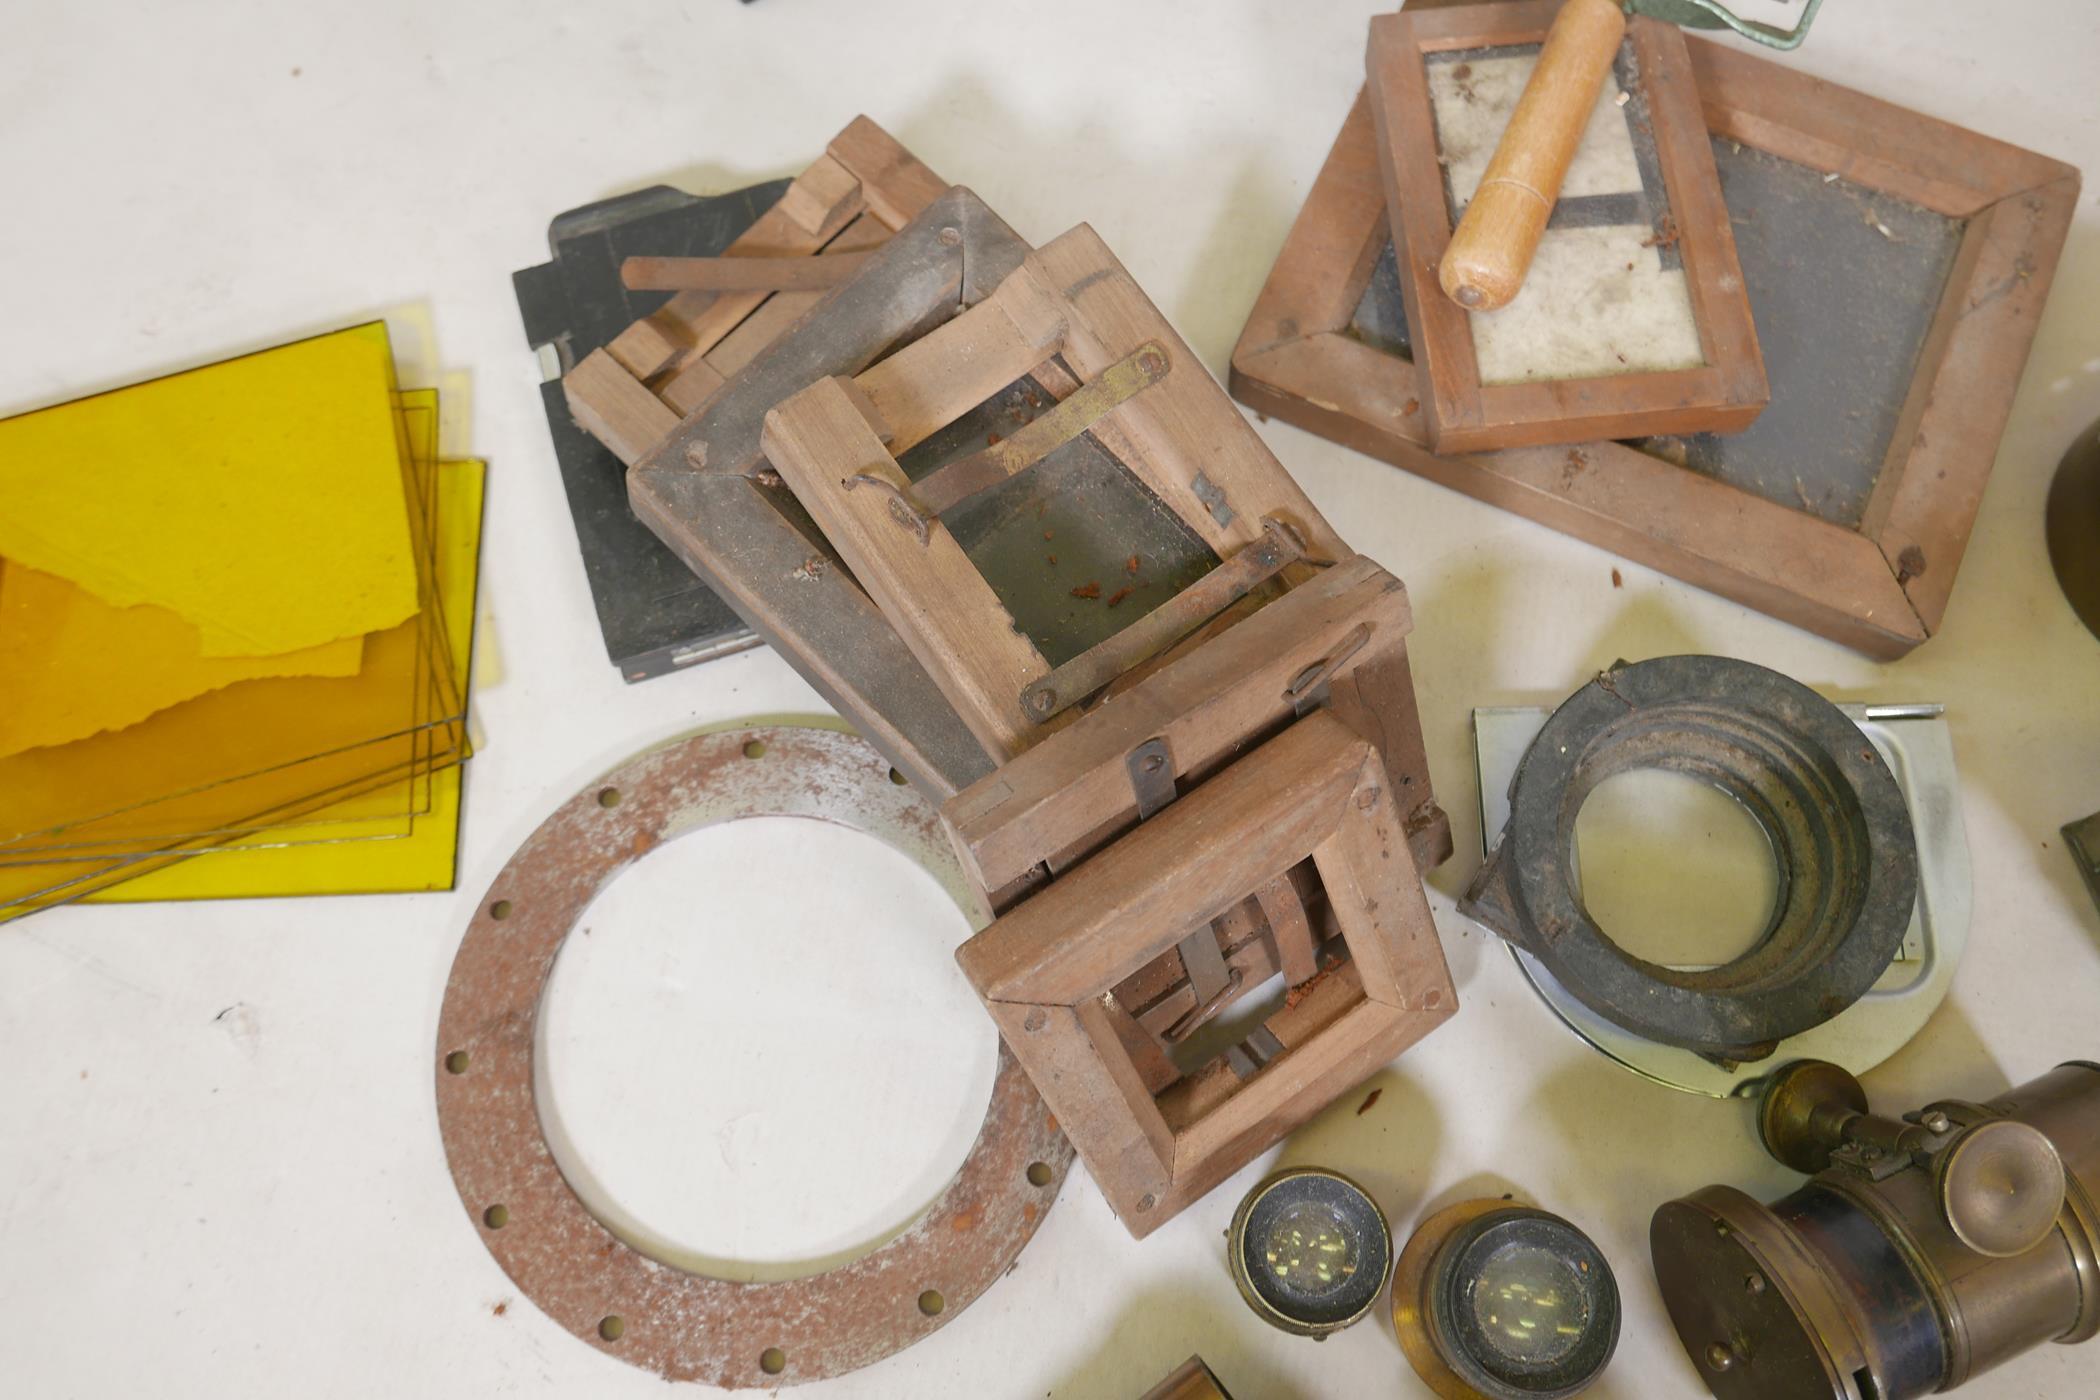 A quantity of antique photography equipment, Engsign Klito, Kodak Duaflex, No2 Hawkeye Model B, - Image 3 of 12